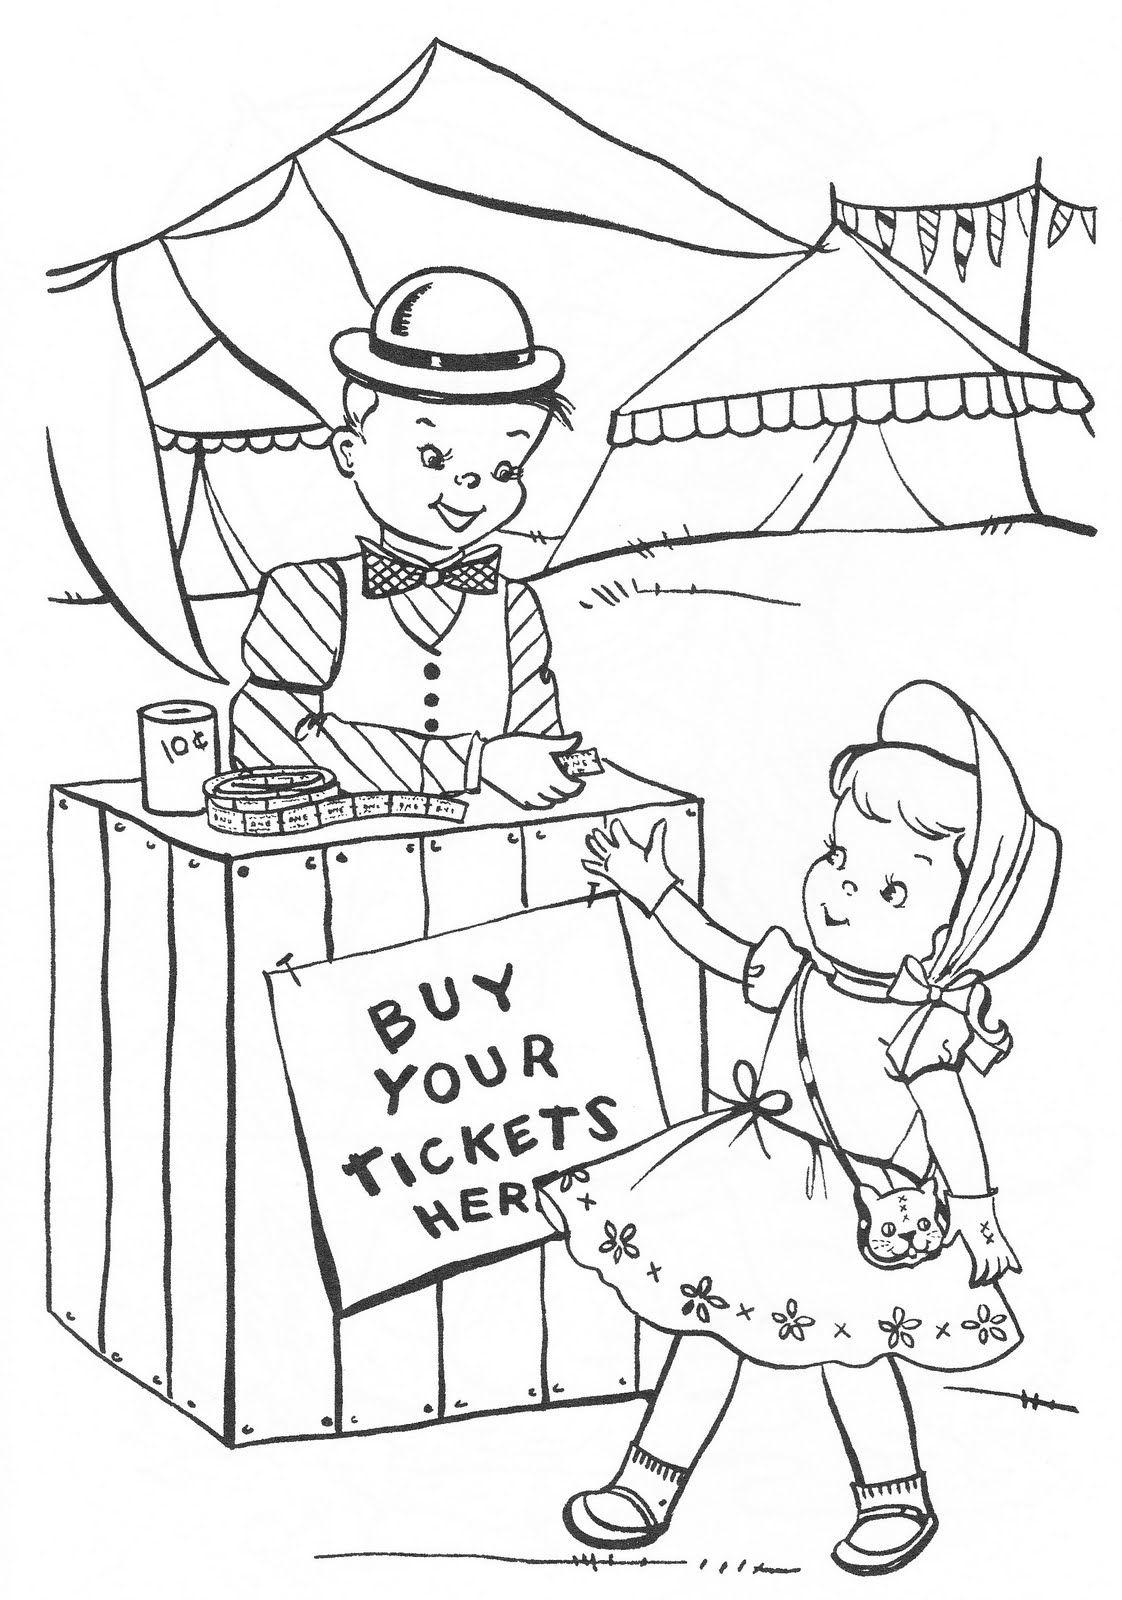 Famoso Colorear Texas Ilustración - Dibujos Para Colorear En Línea ...